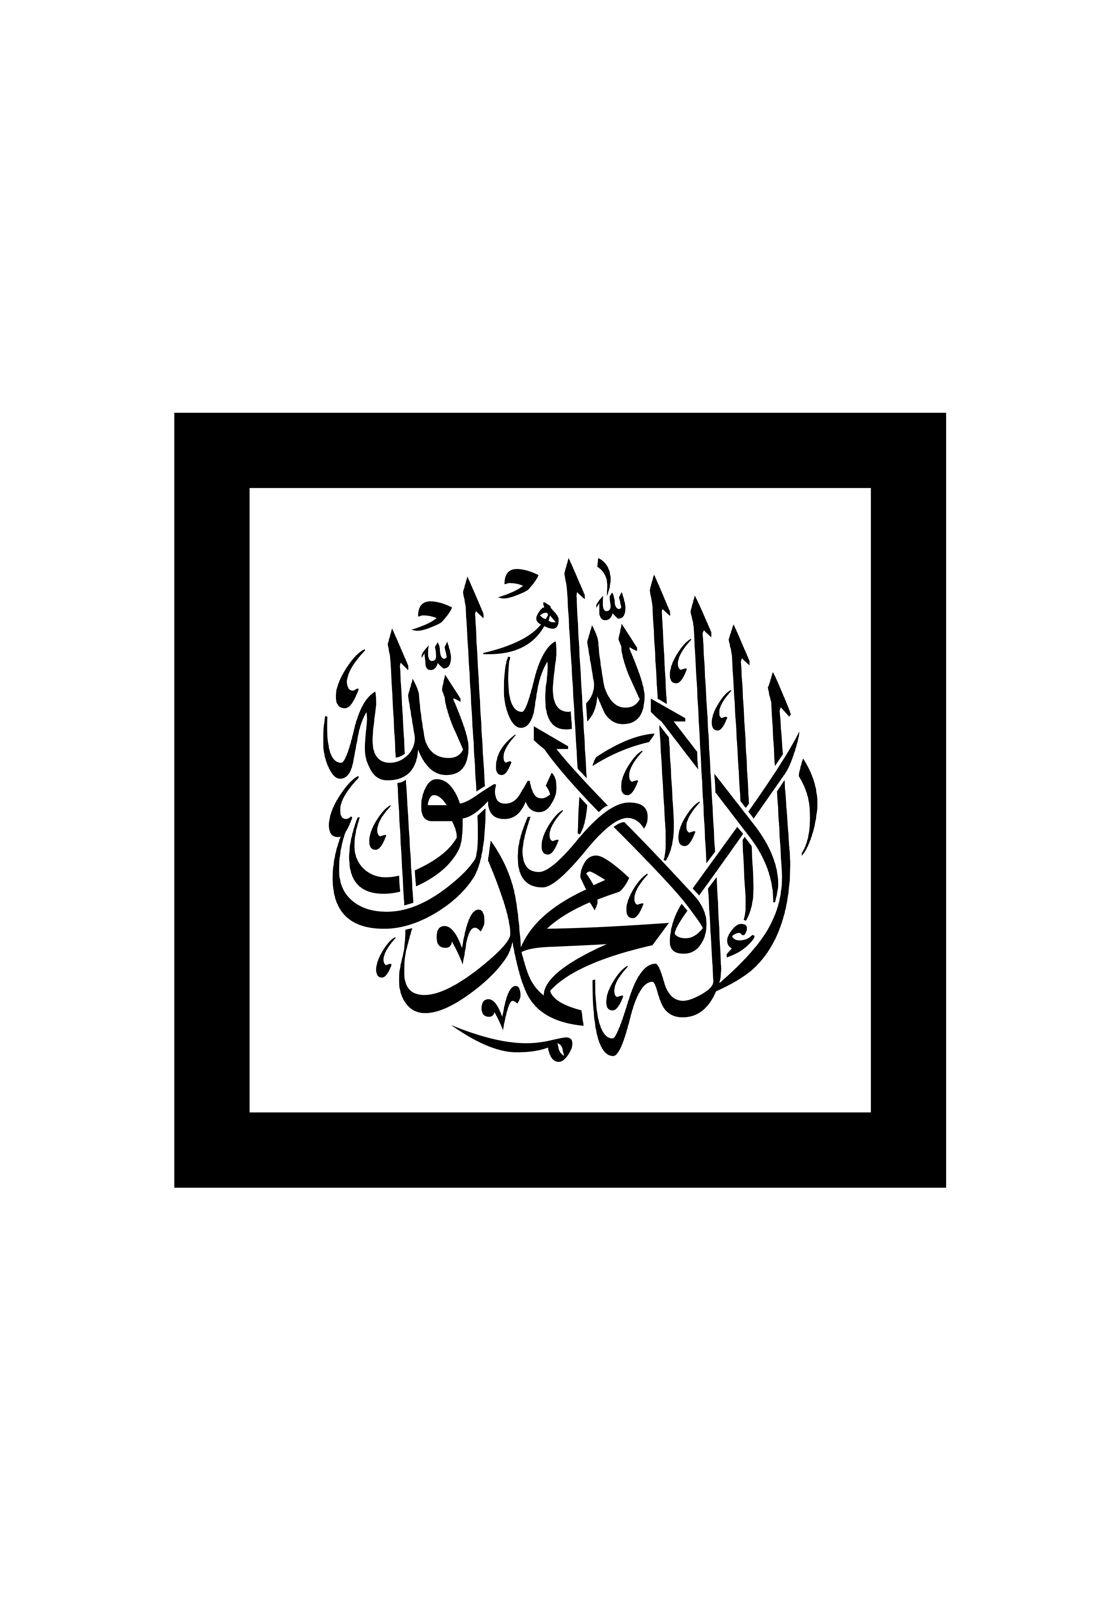 shahada_opt